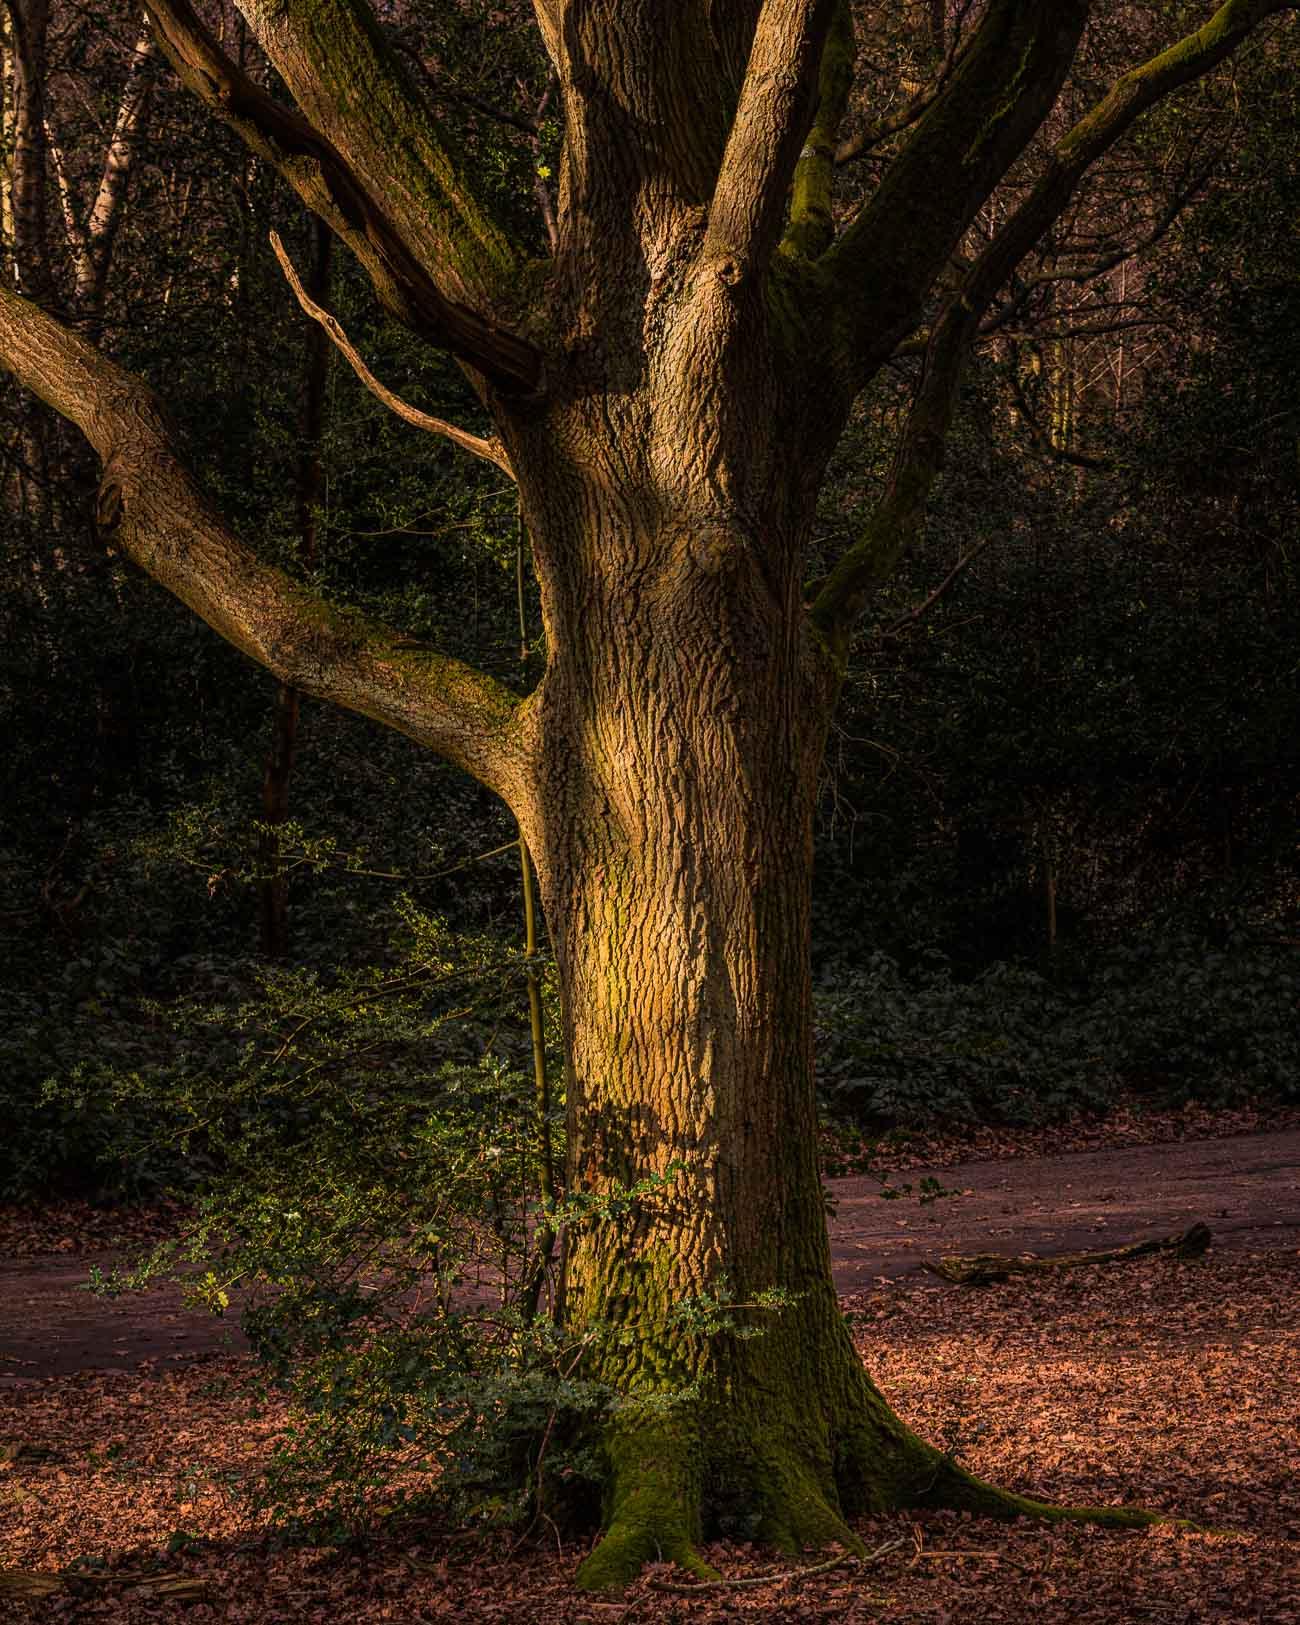 Lone tree in golden light